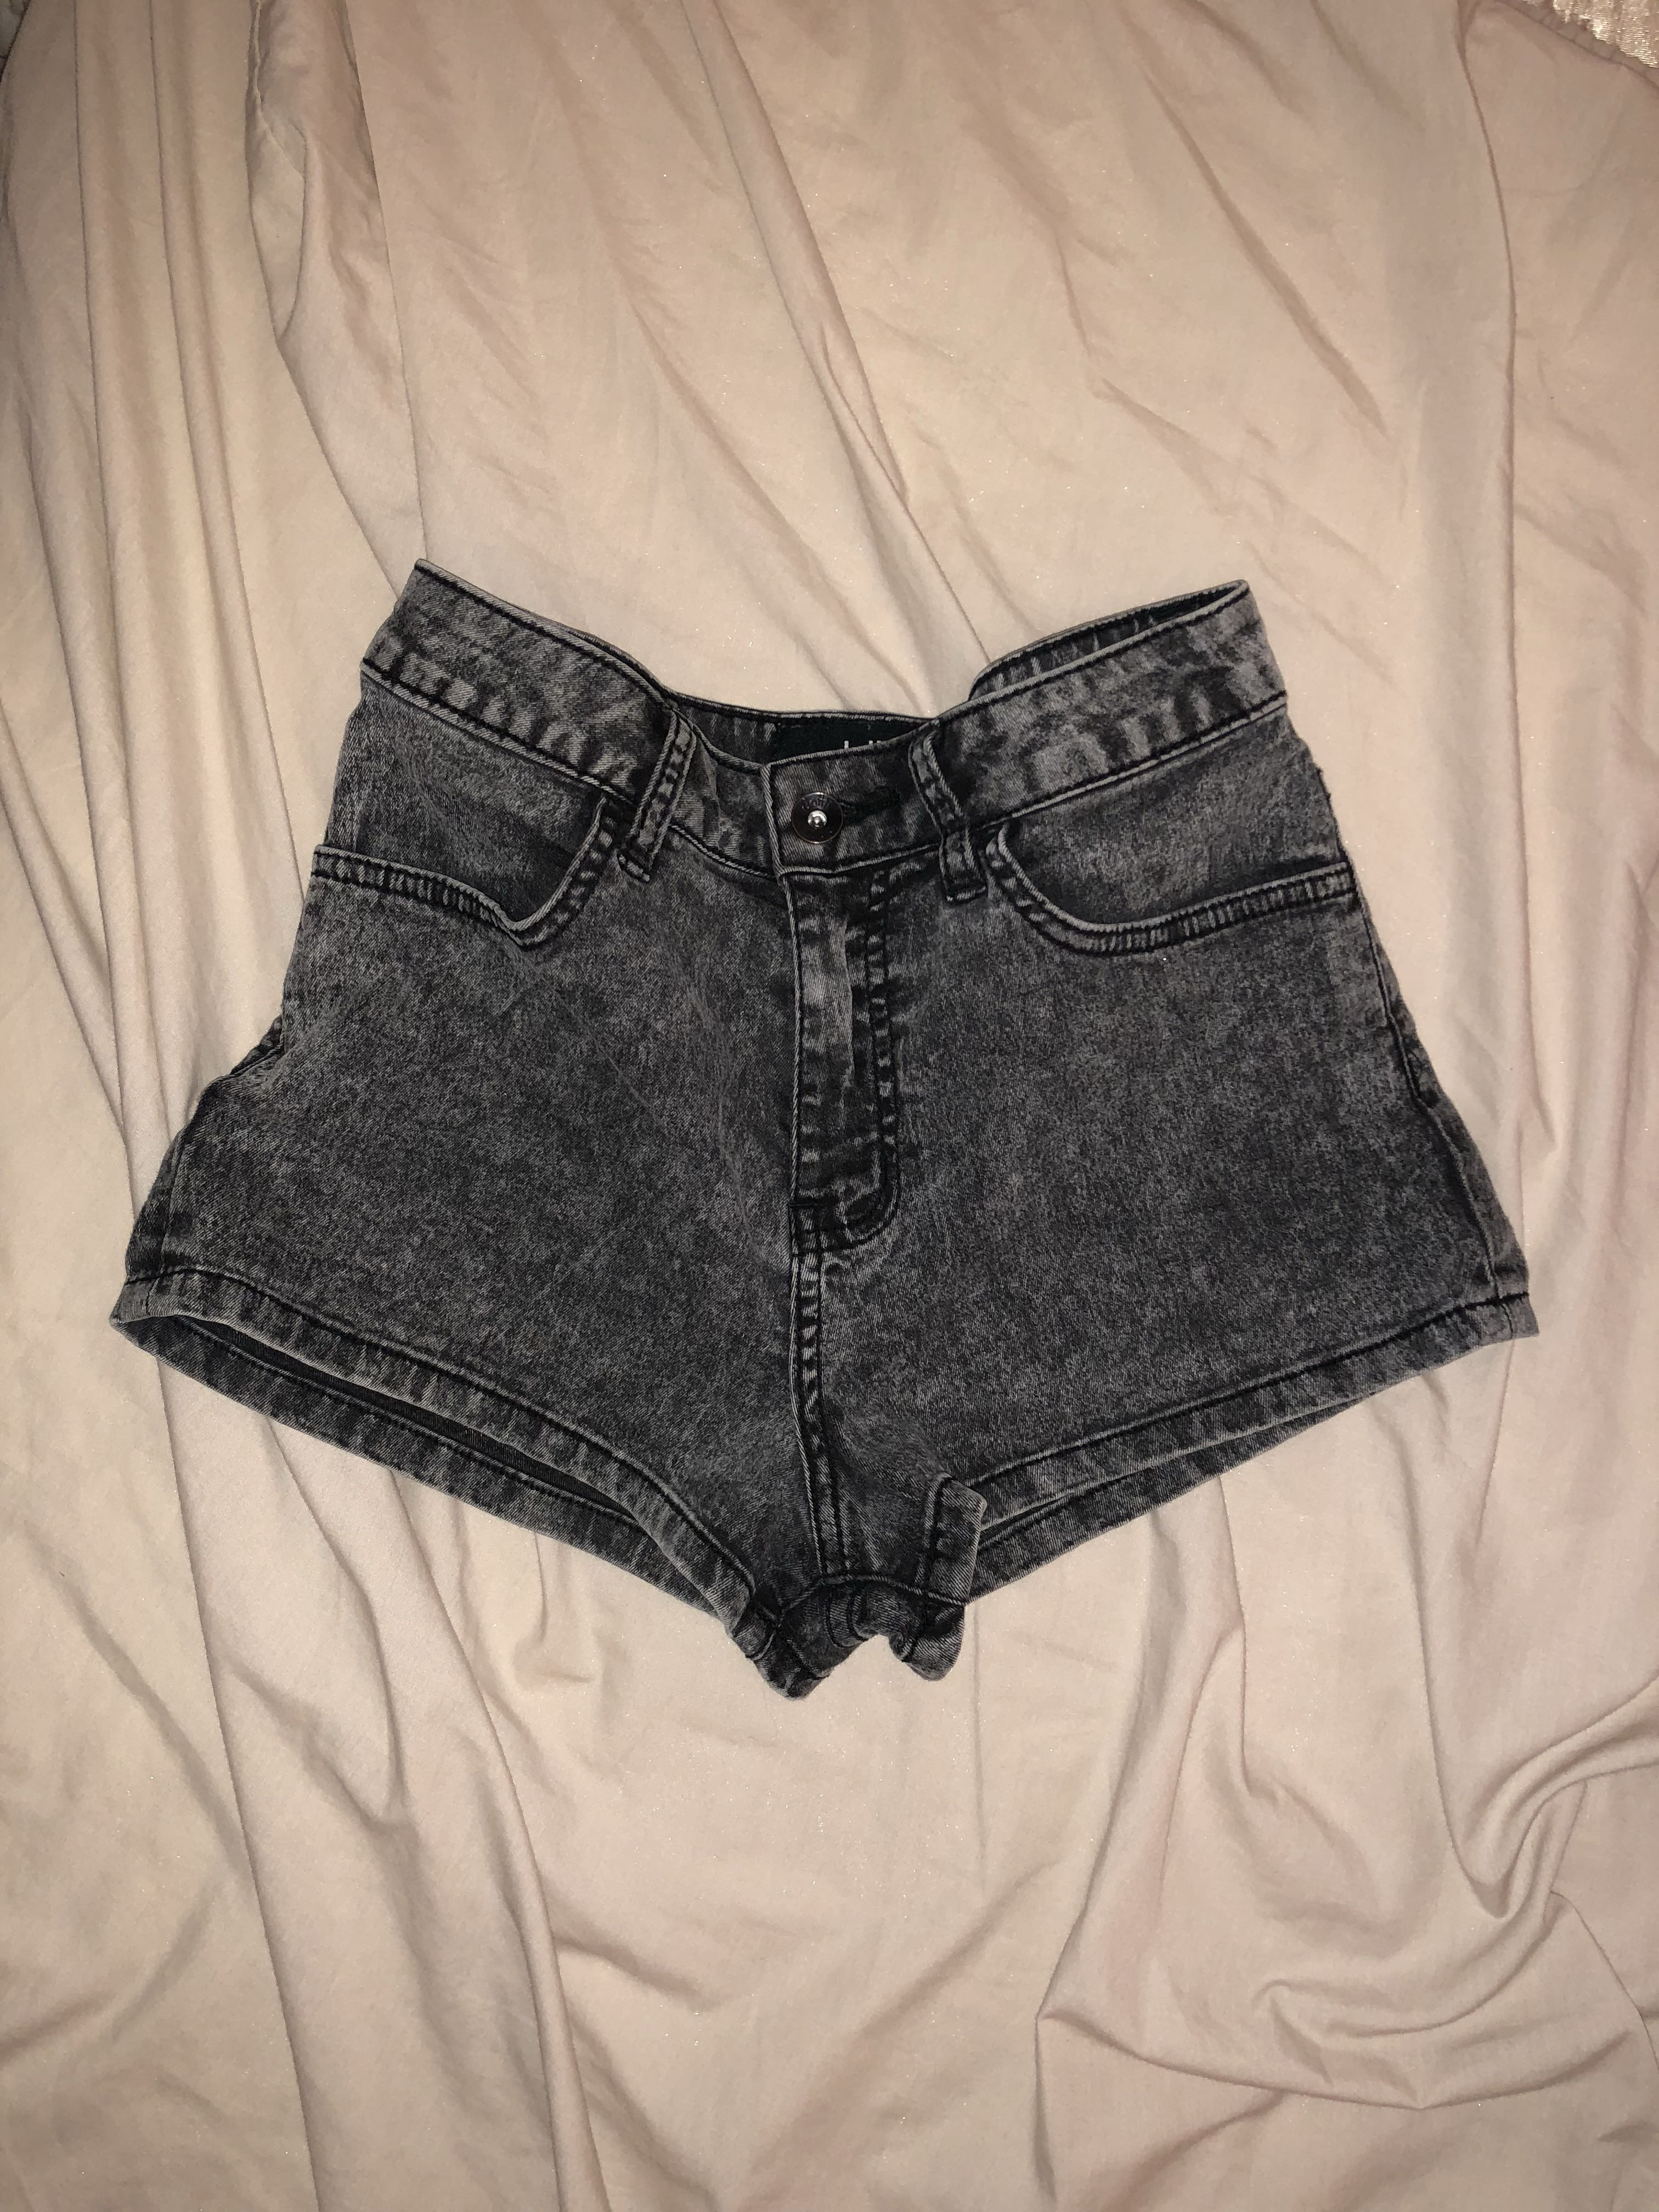 Grey Black Denim Jean Shorts